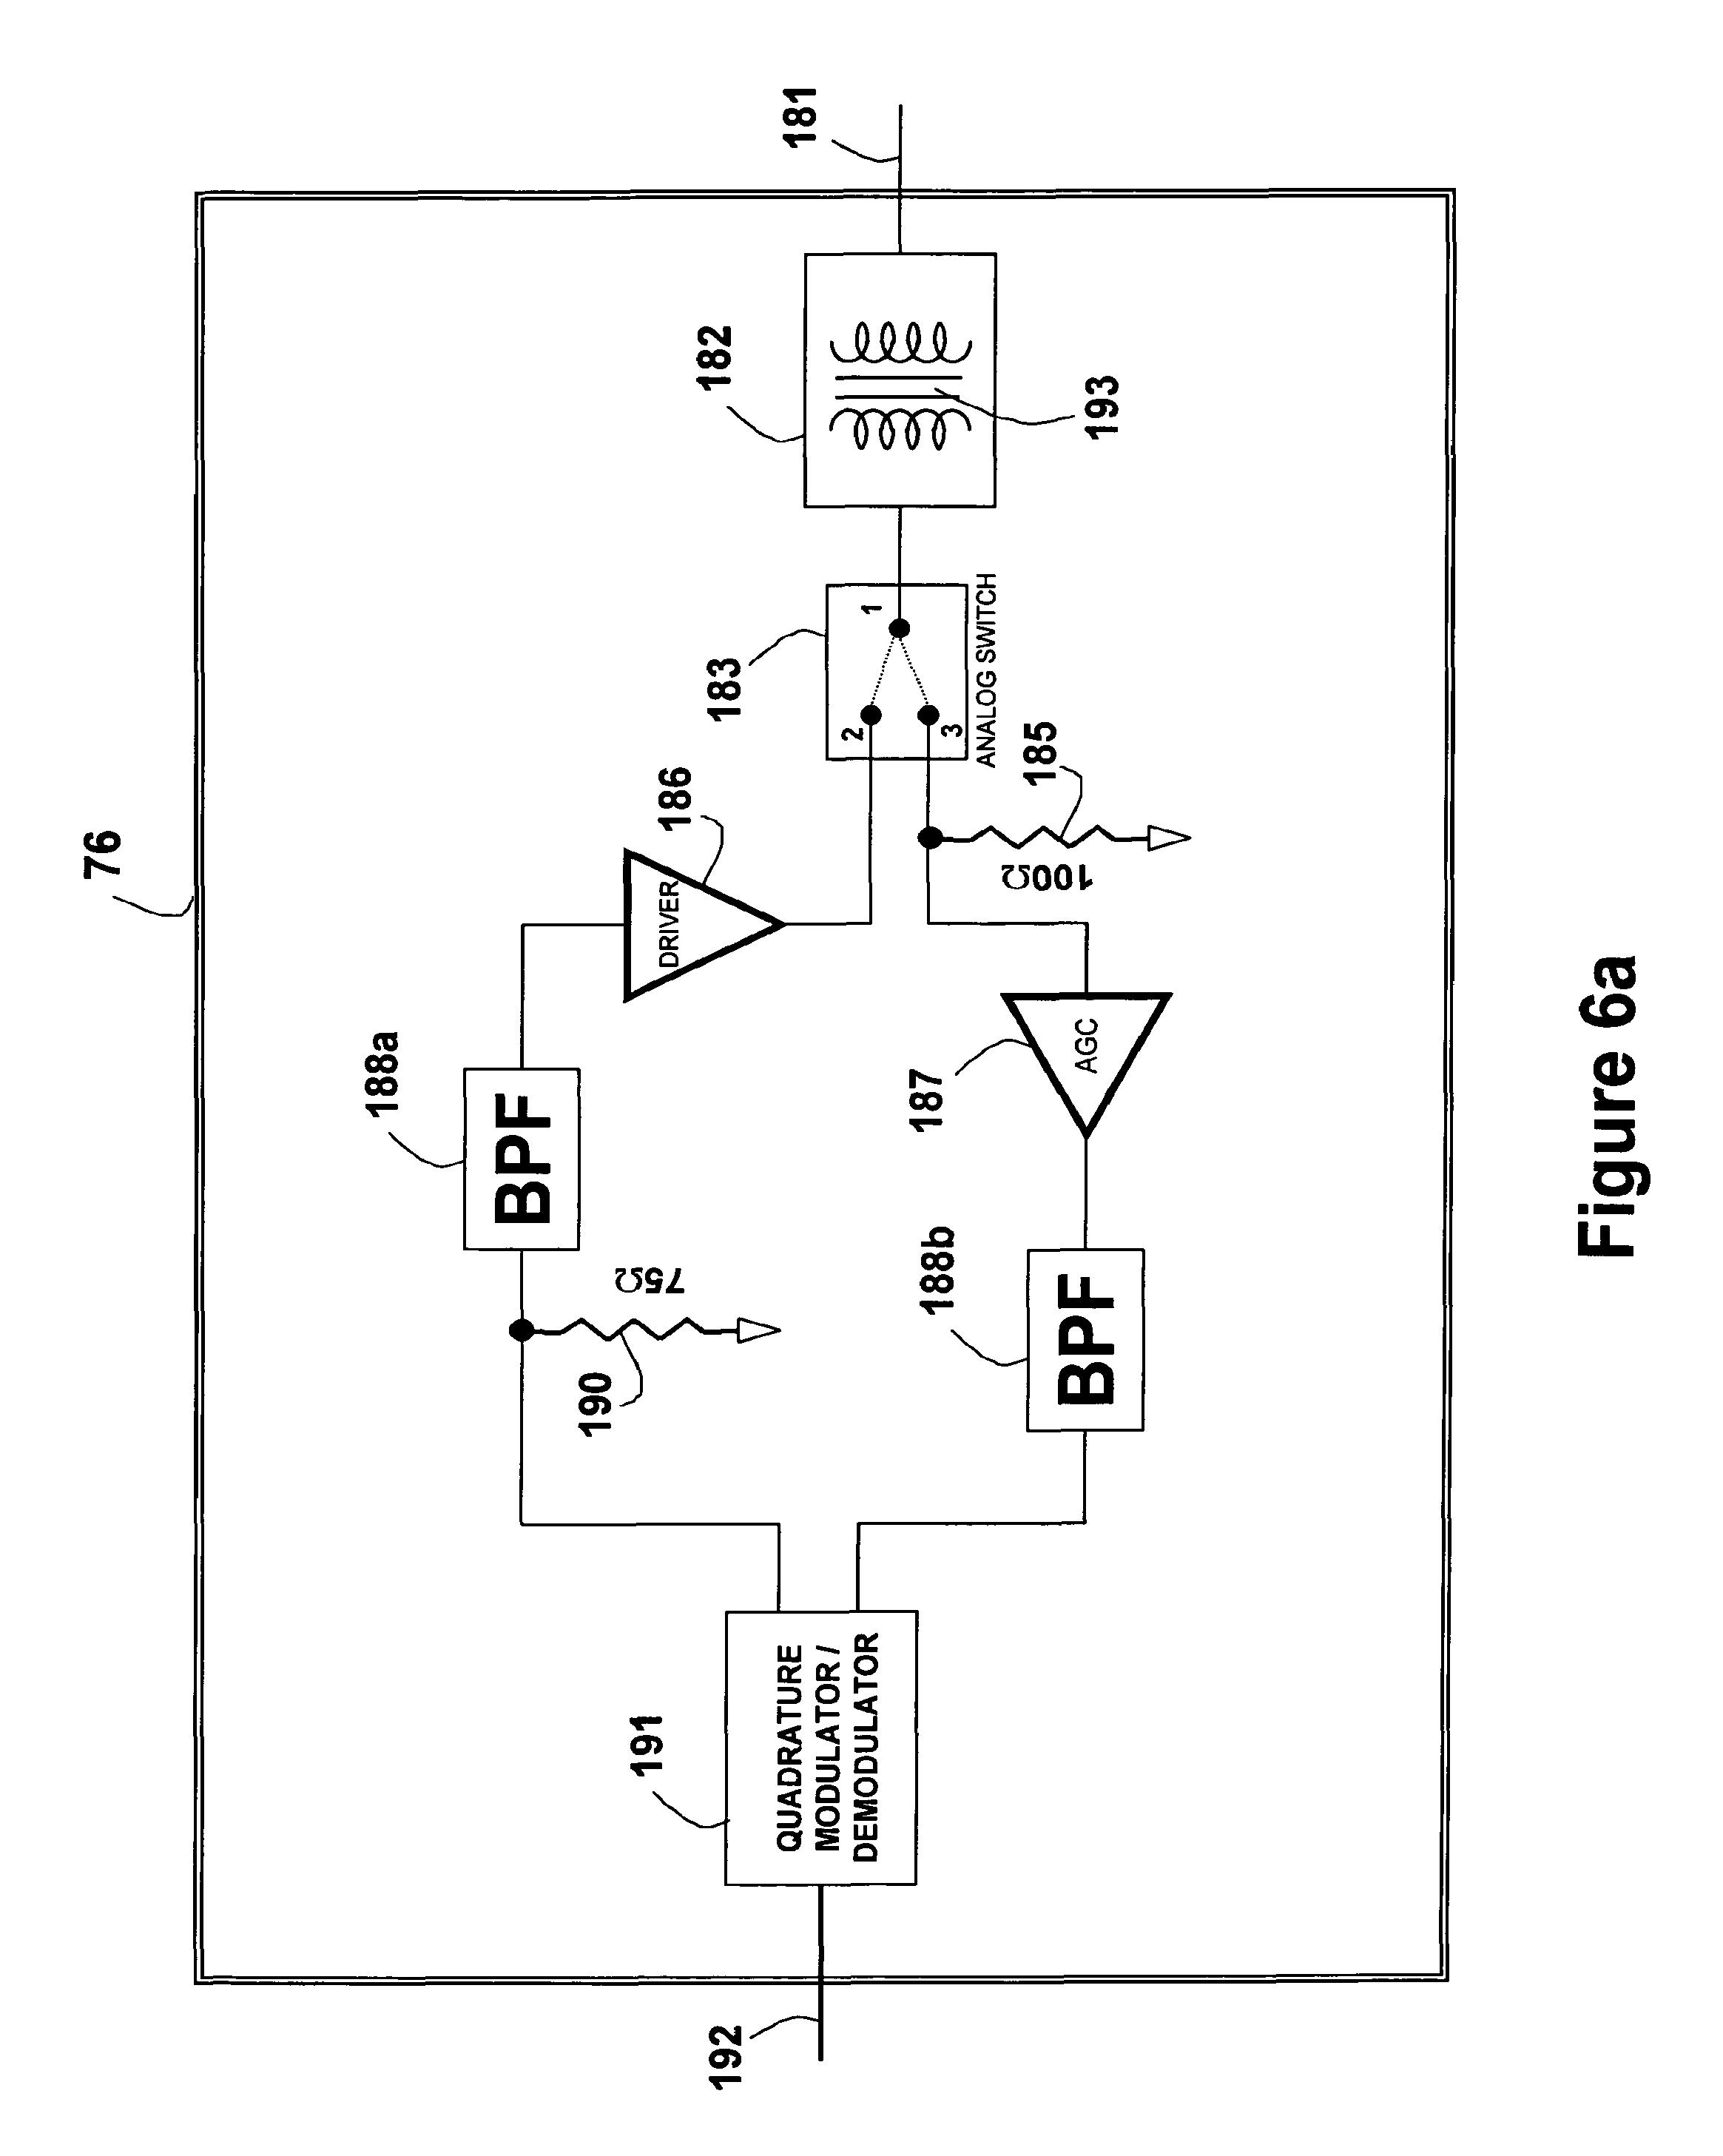 Usb pinout to ieee 1394 4 pin pinout diagram firewire